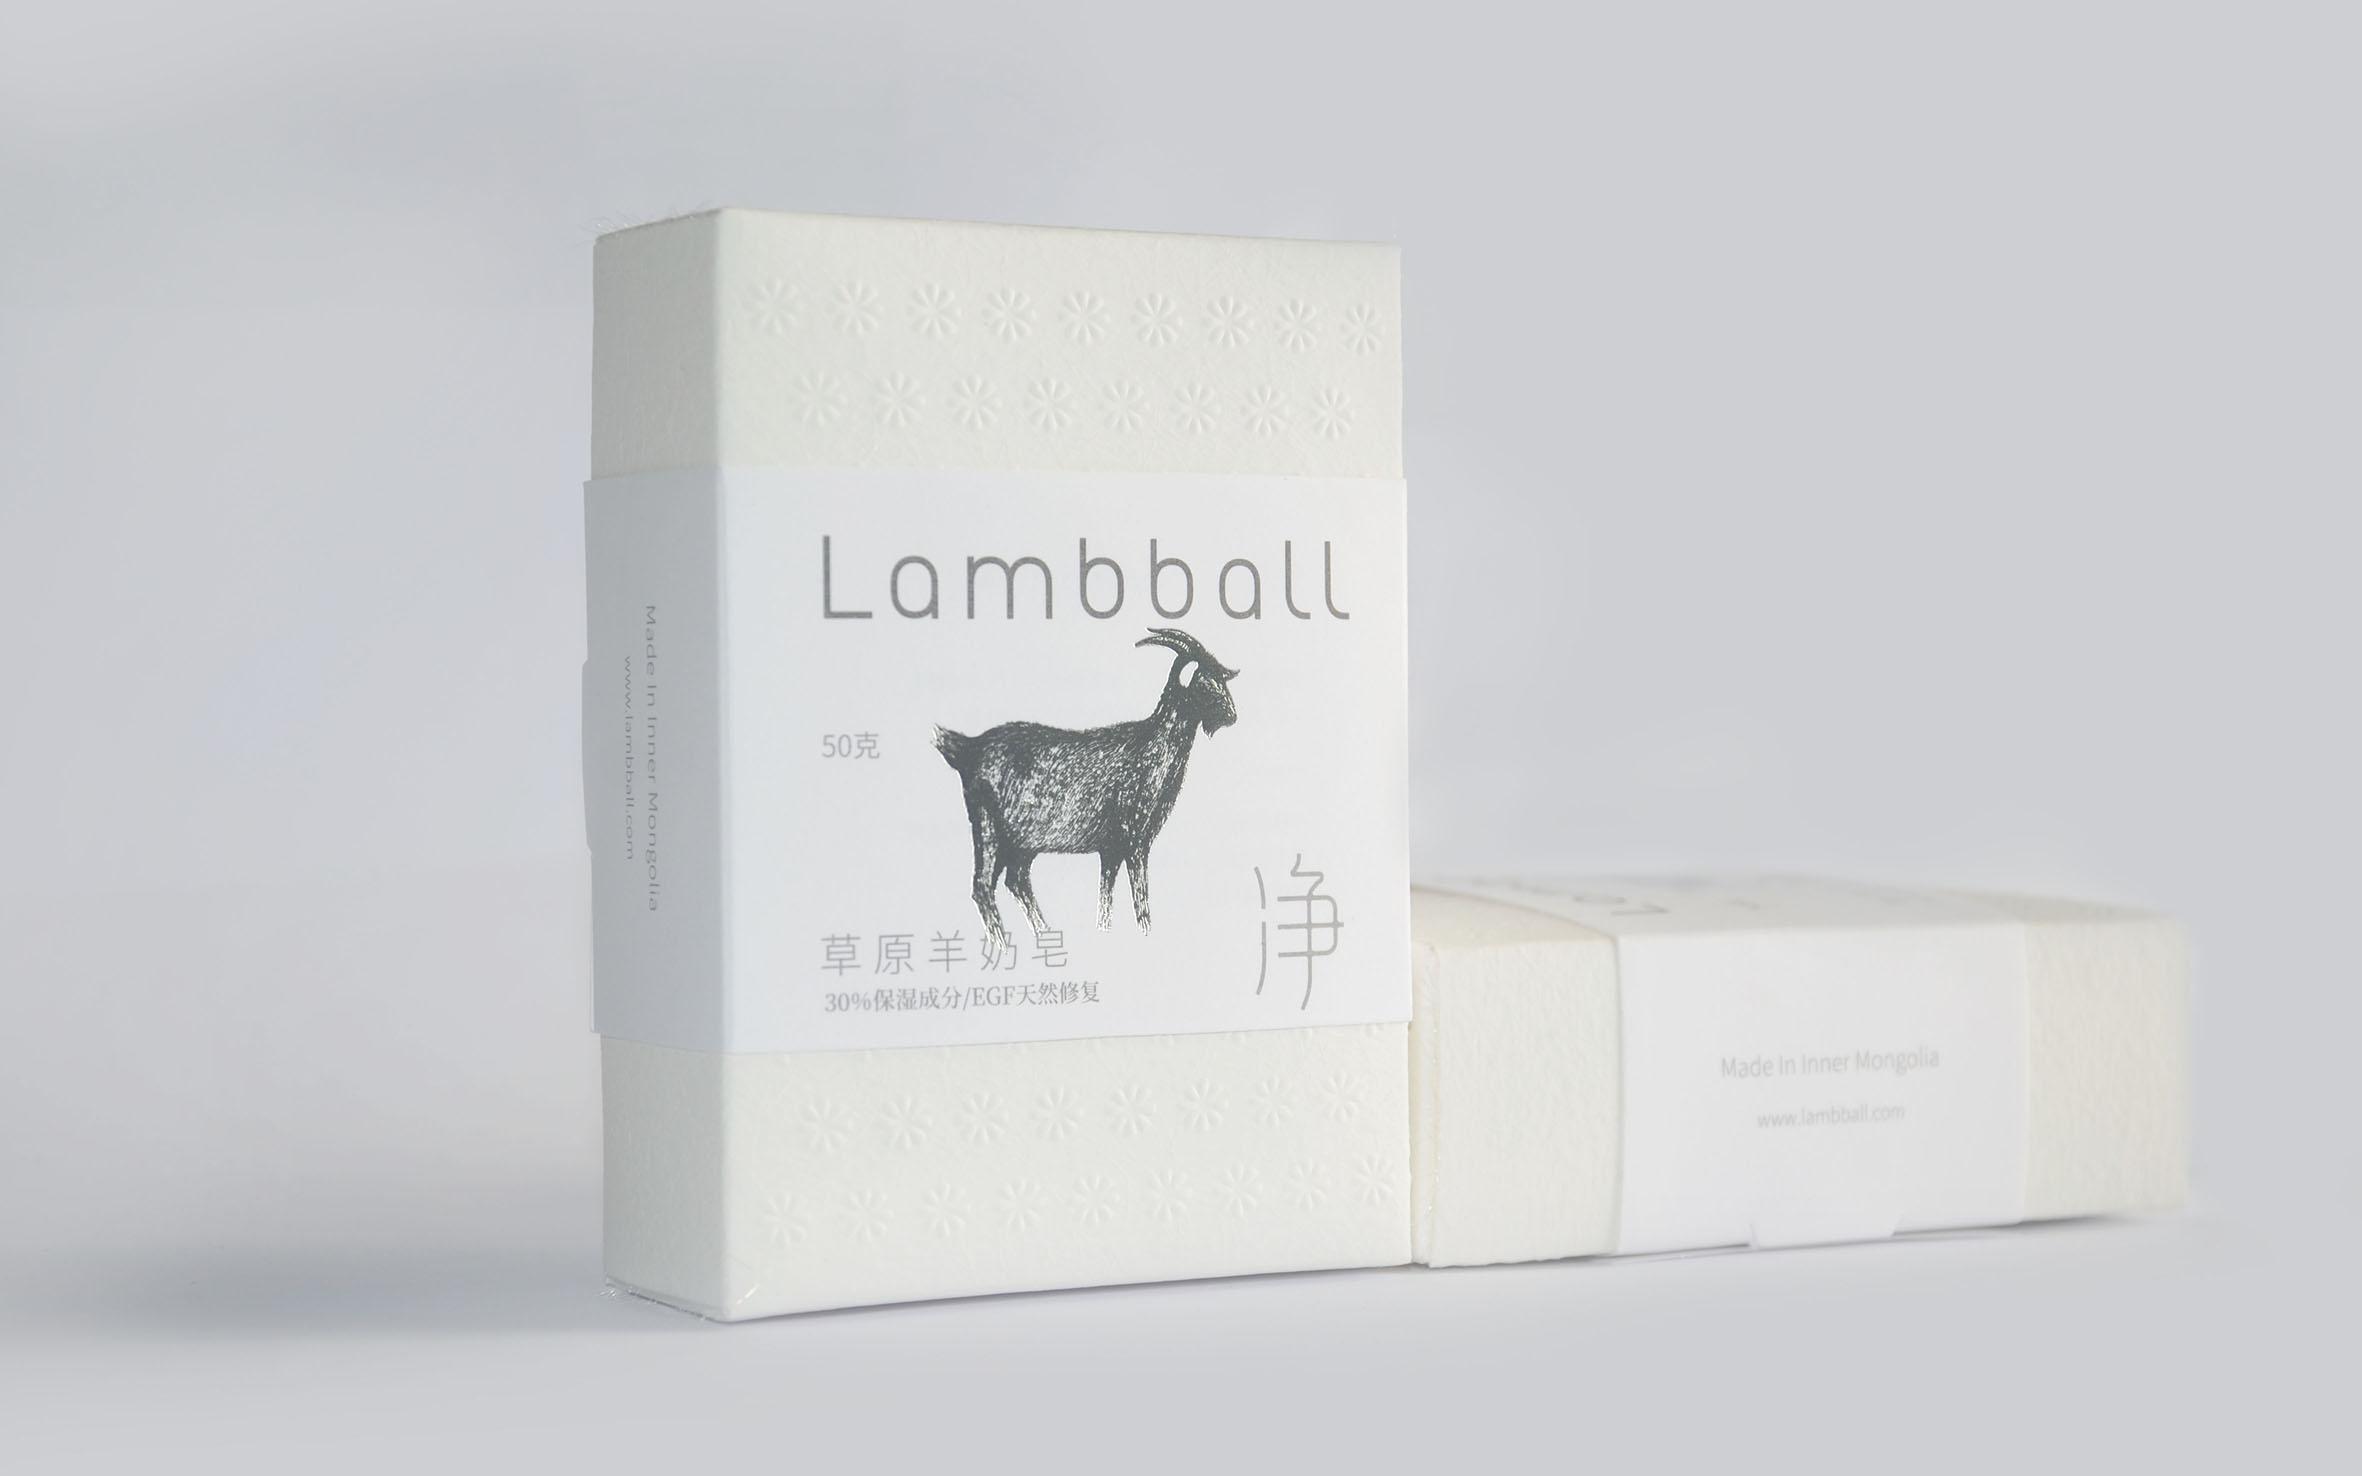 lambball羊奶皂包装设计 第12张